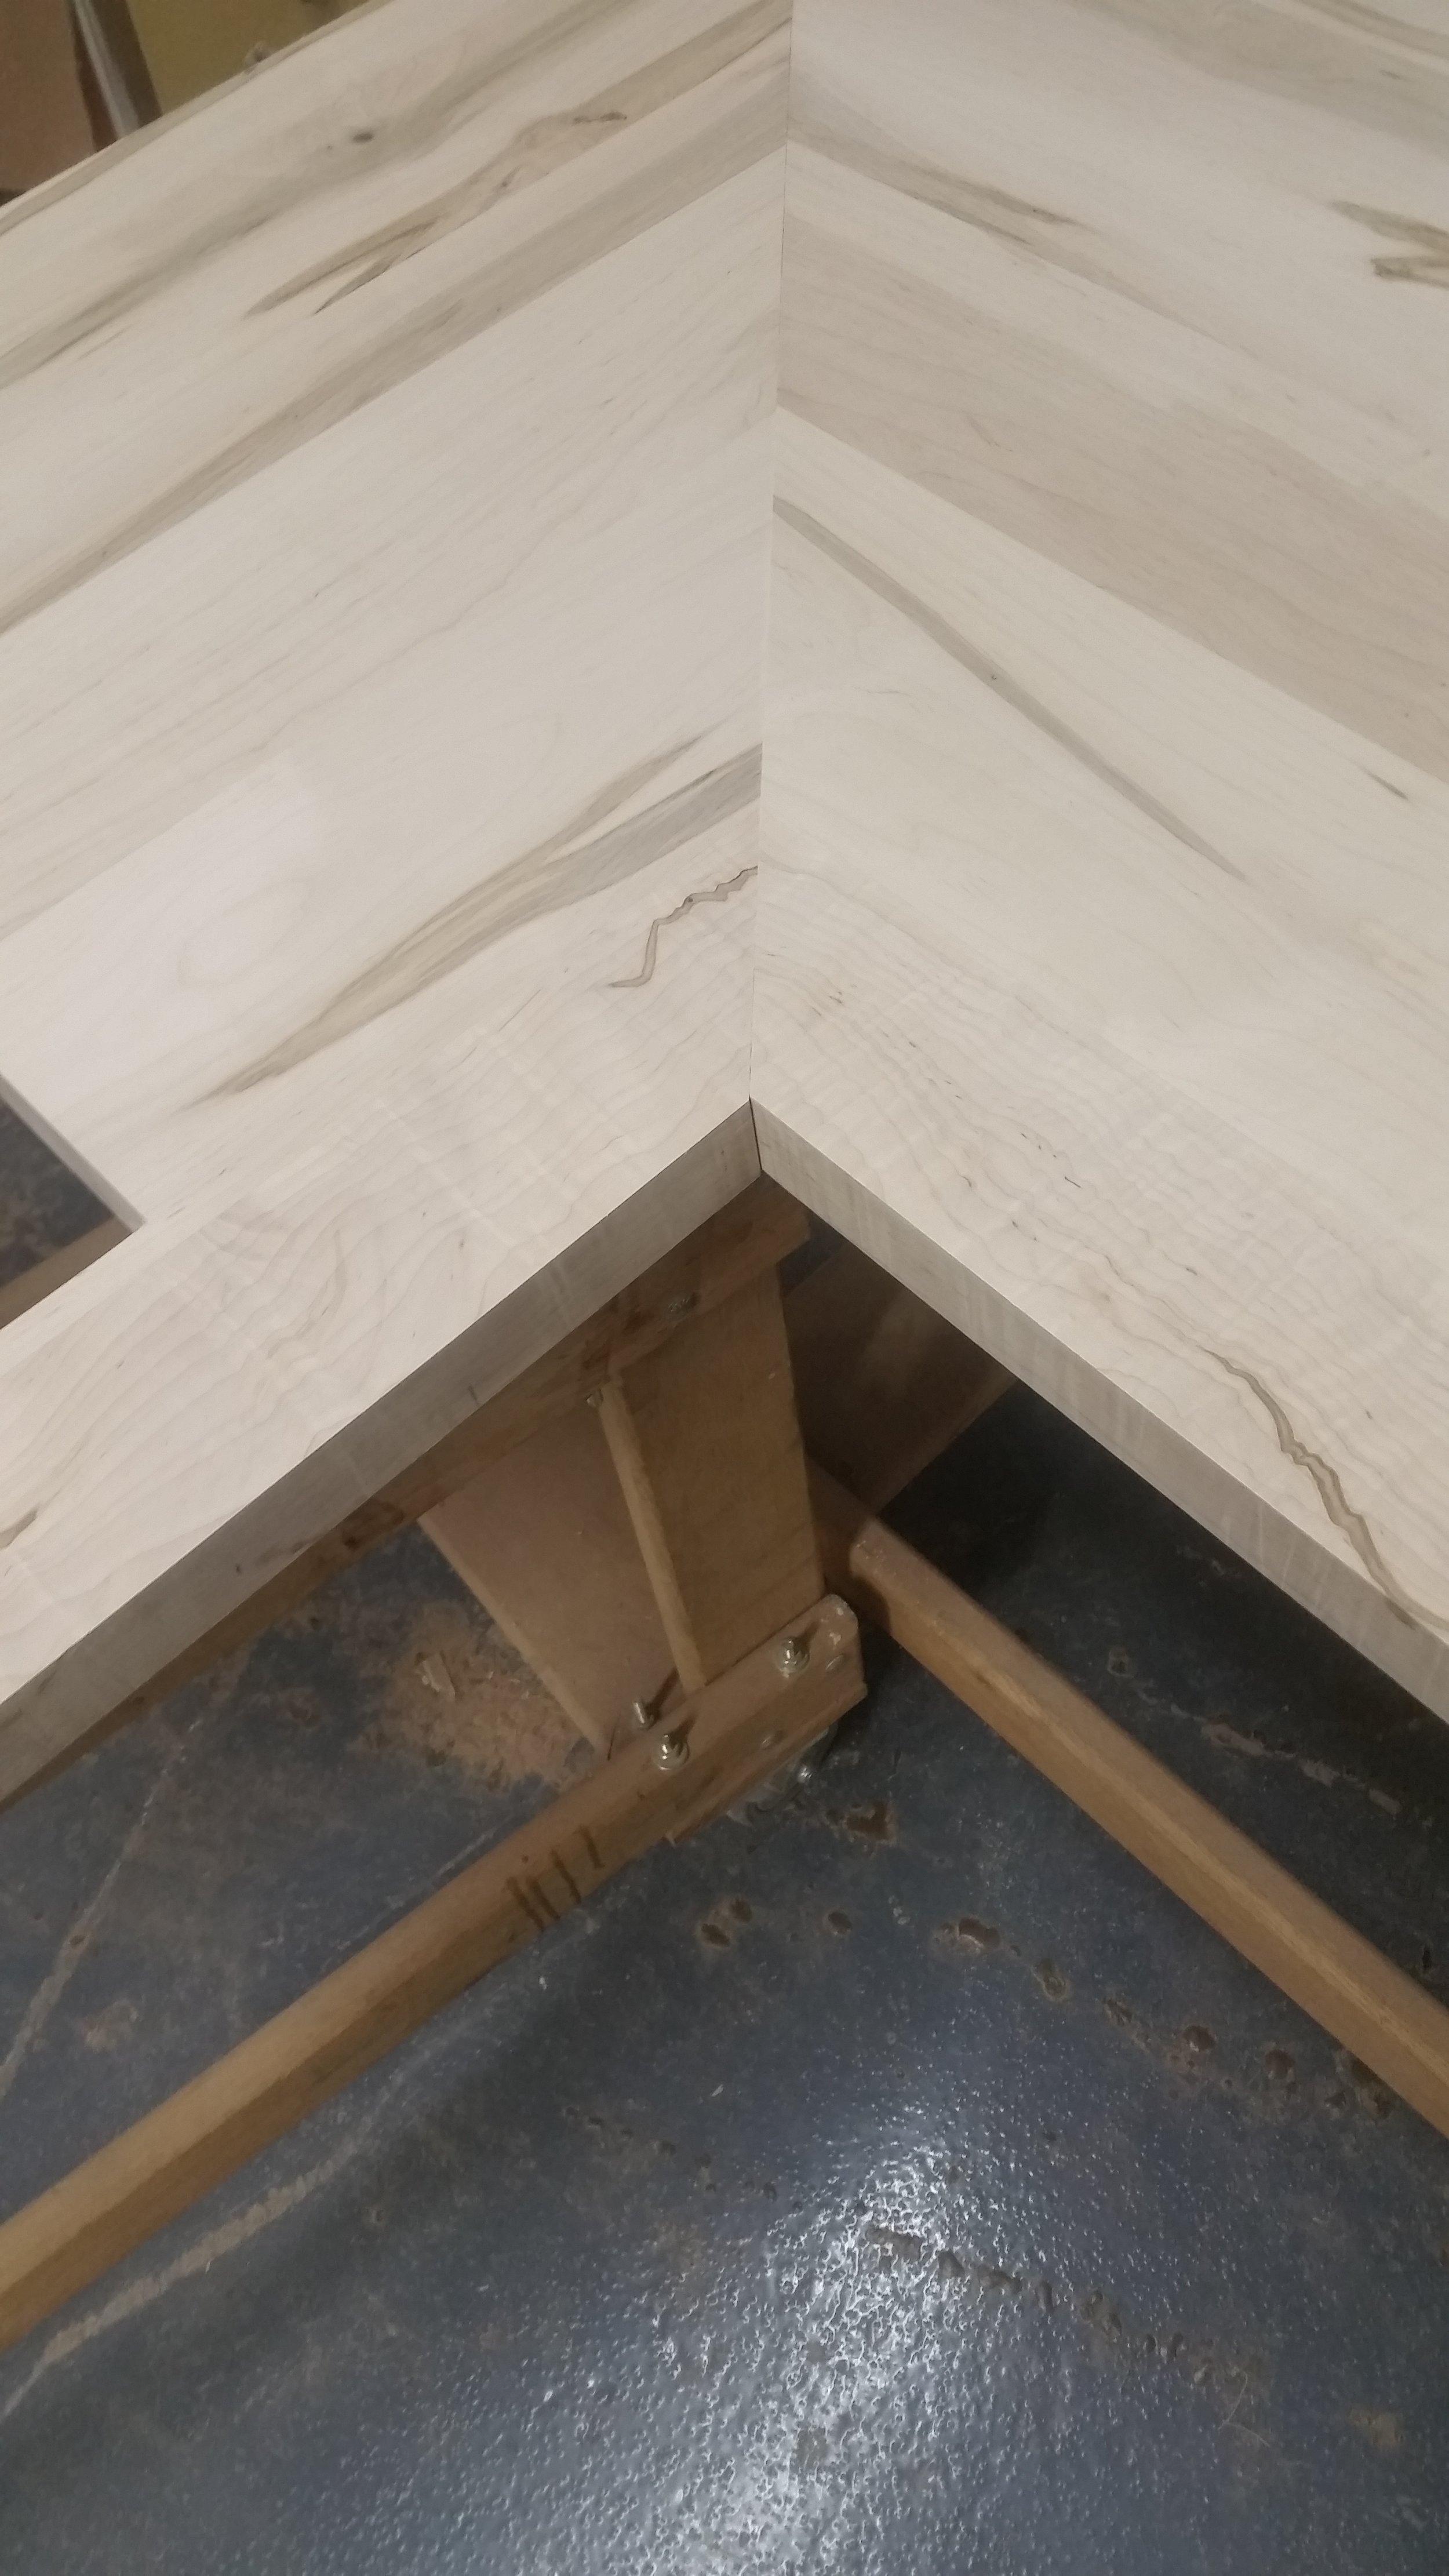 45-degree-miter-table.jpg